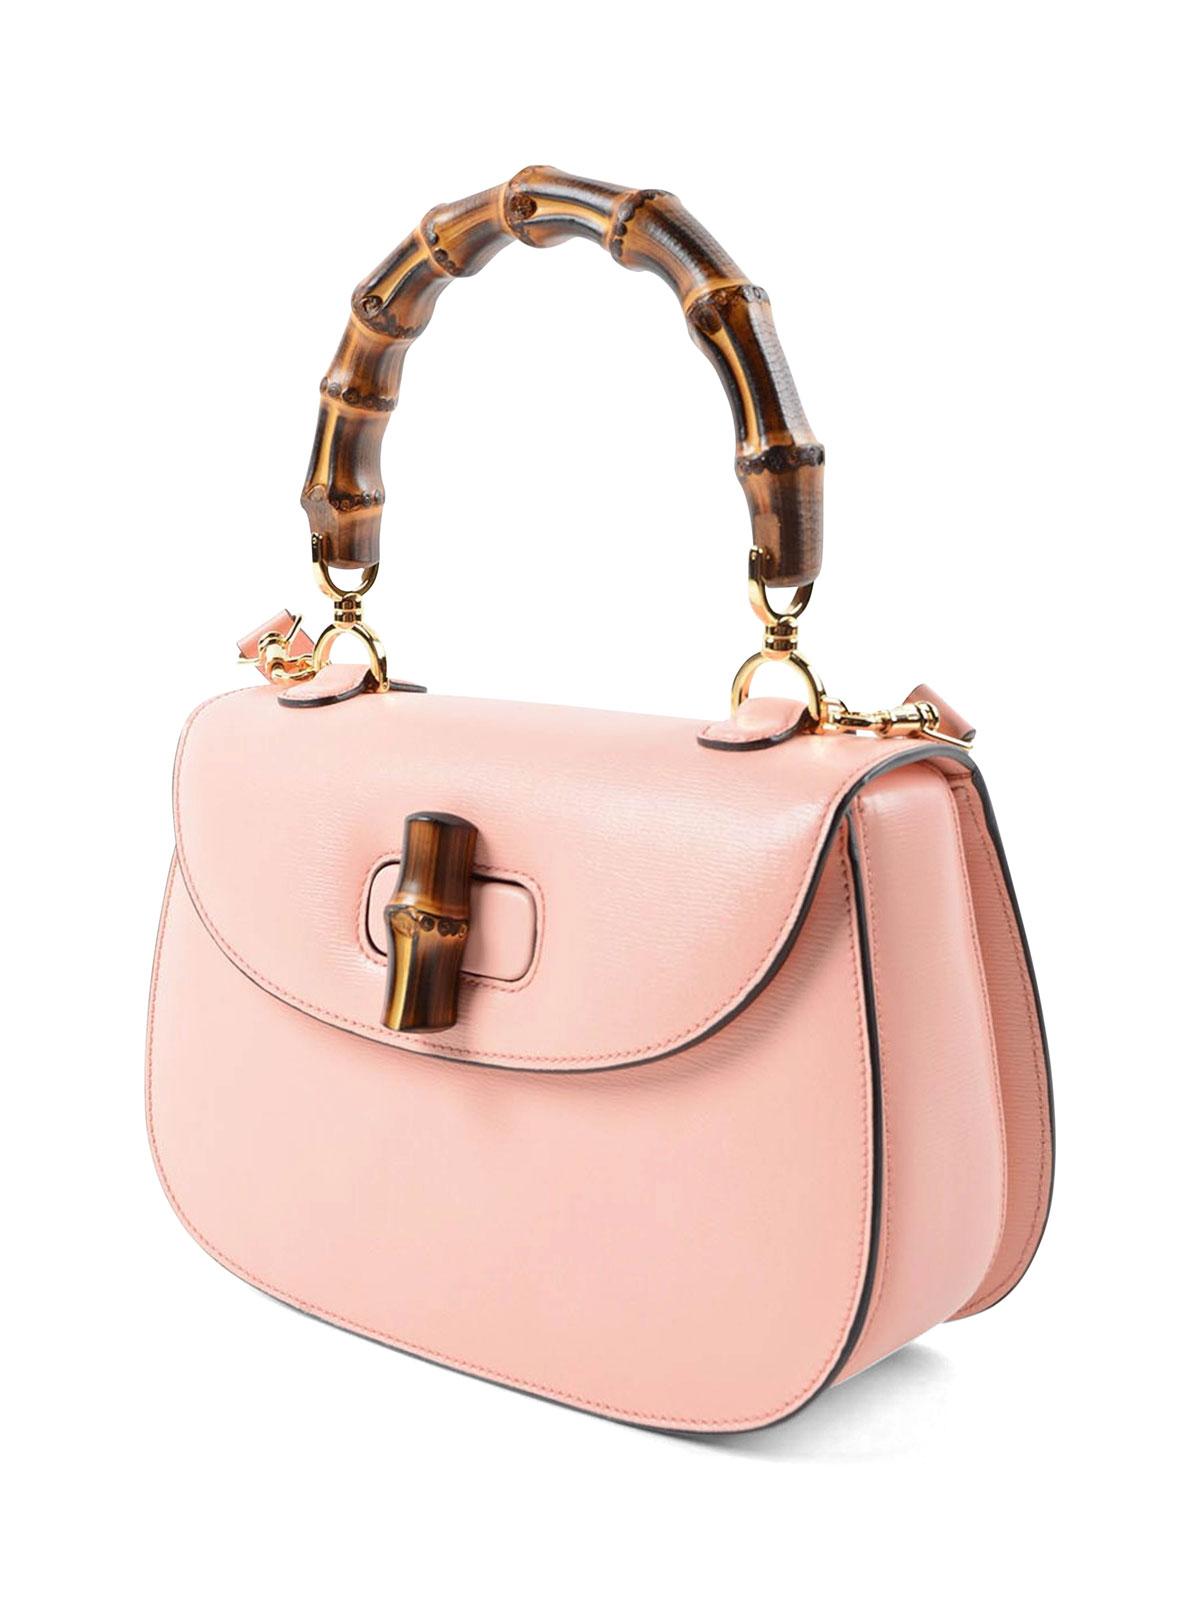 85e21bcd651 Gucci - Gucci Bamboo leather small tote - totes bags - 409398 ARU0G 6807